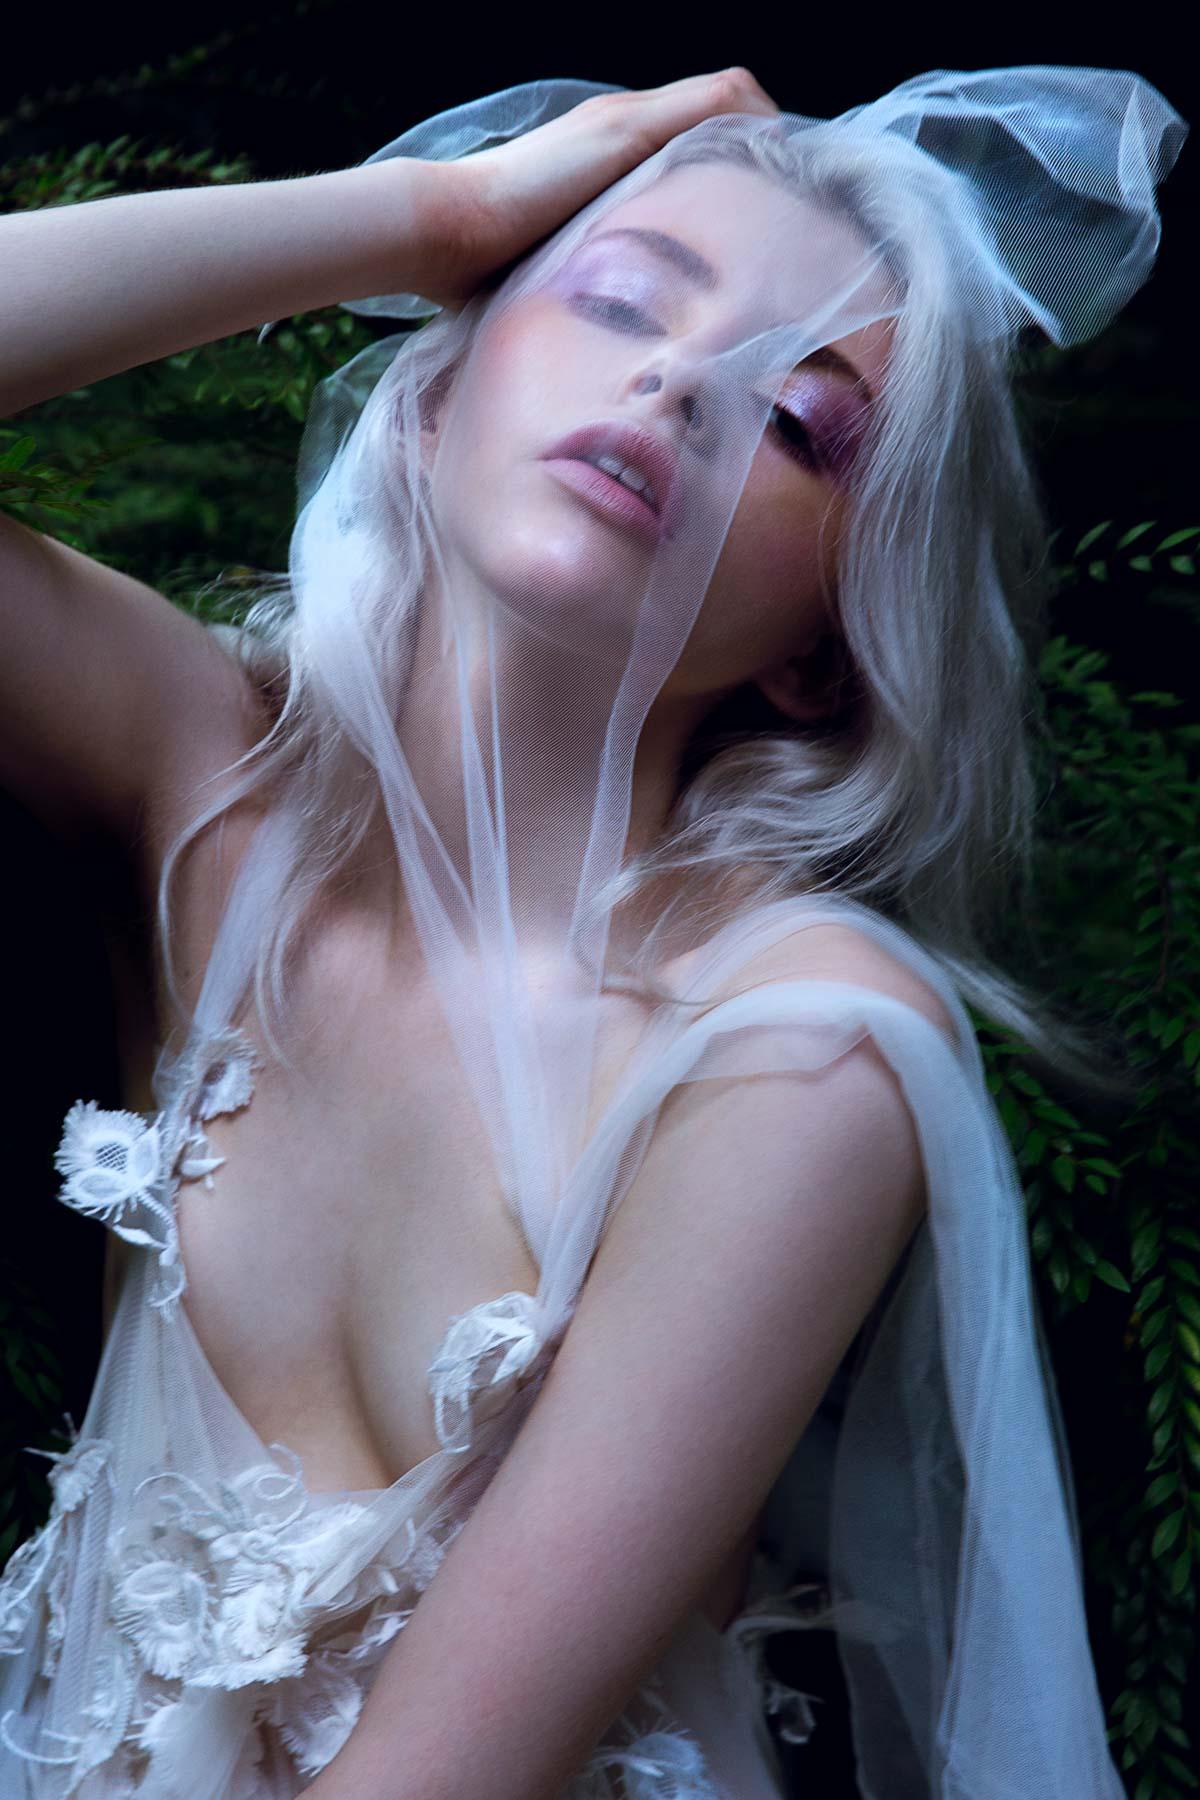 the_forest_magazine_amberly_valentine-neve-angie_angorro_0005